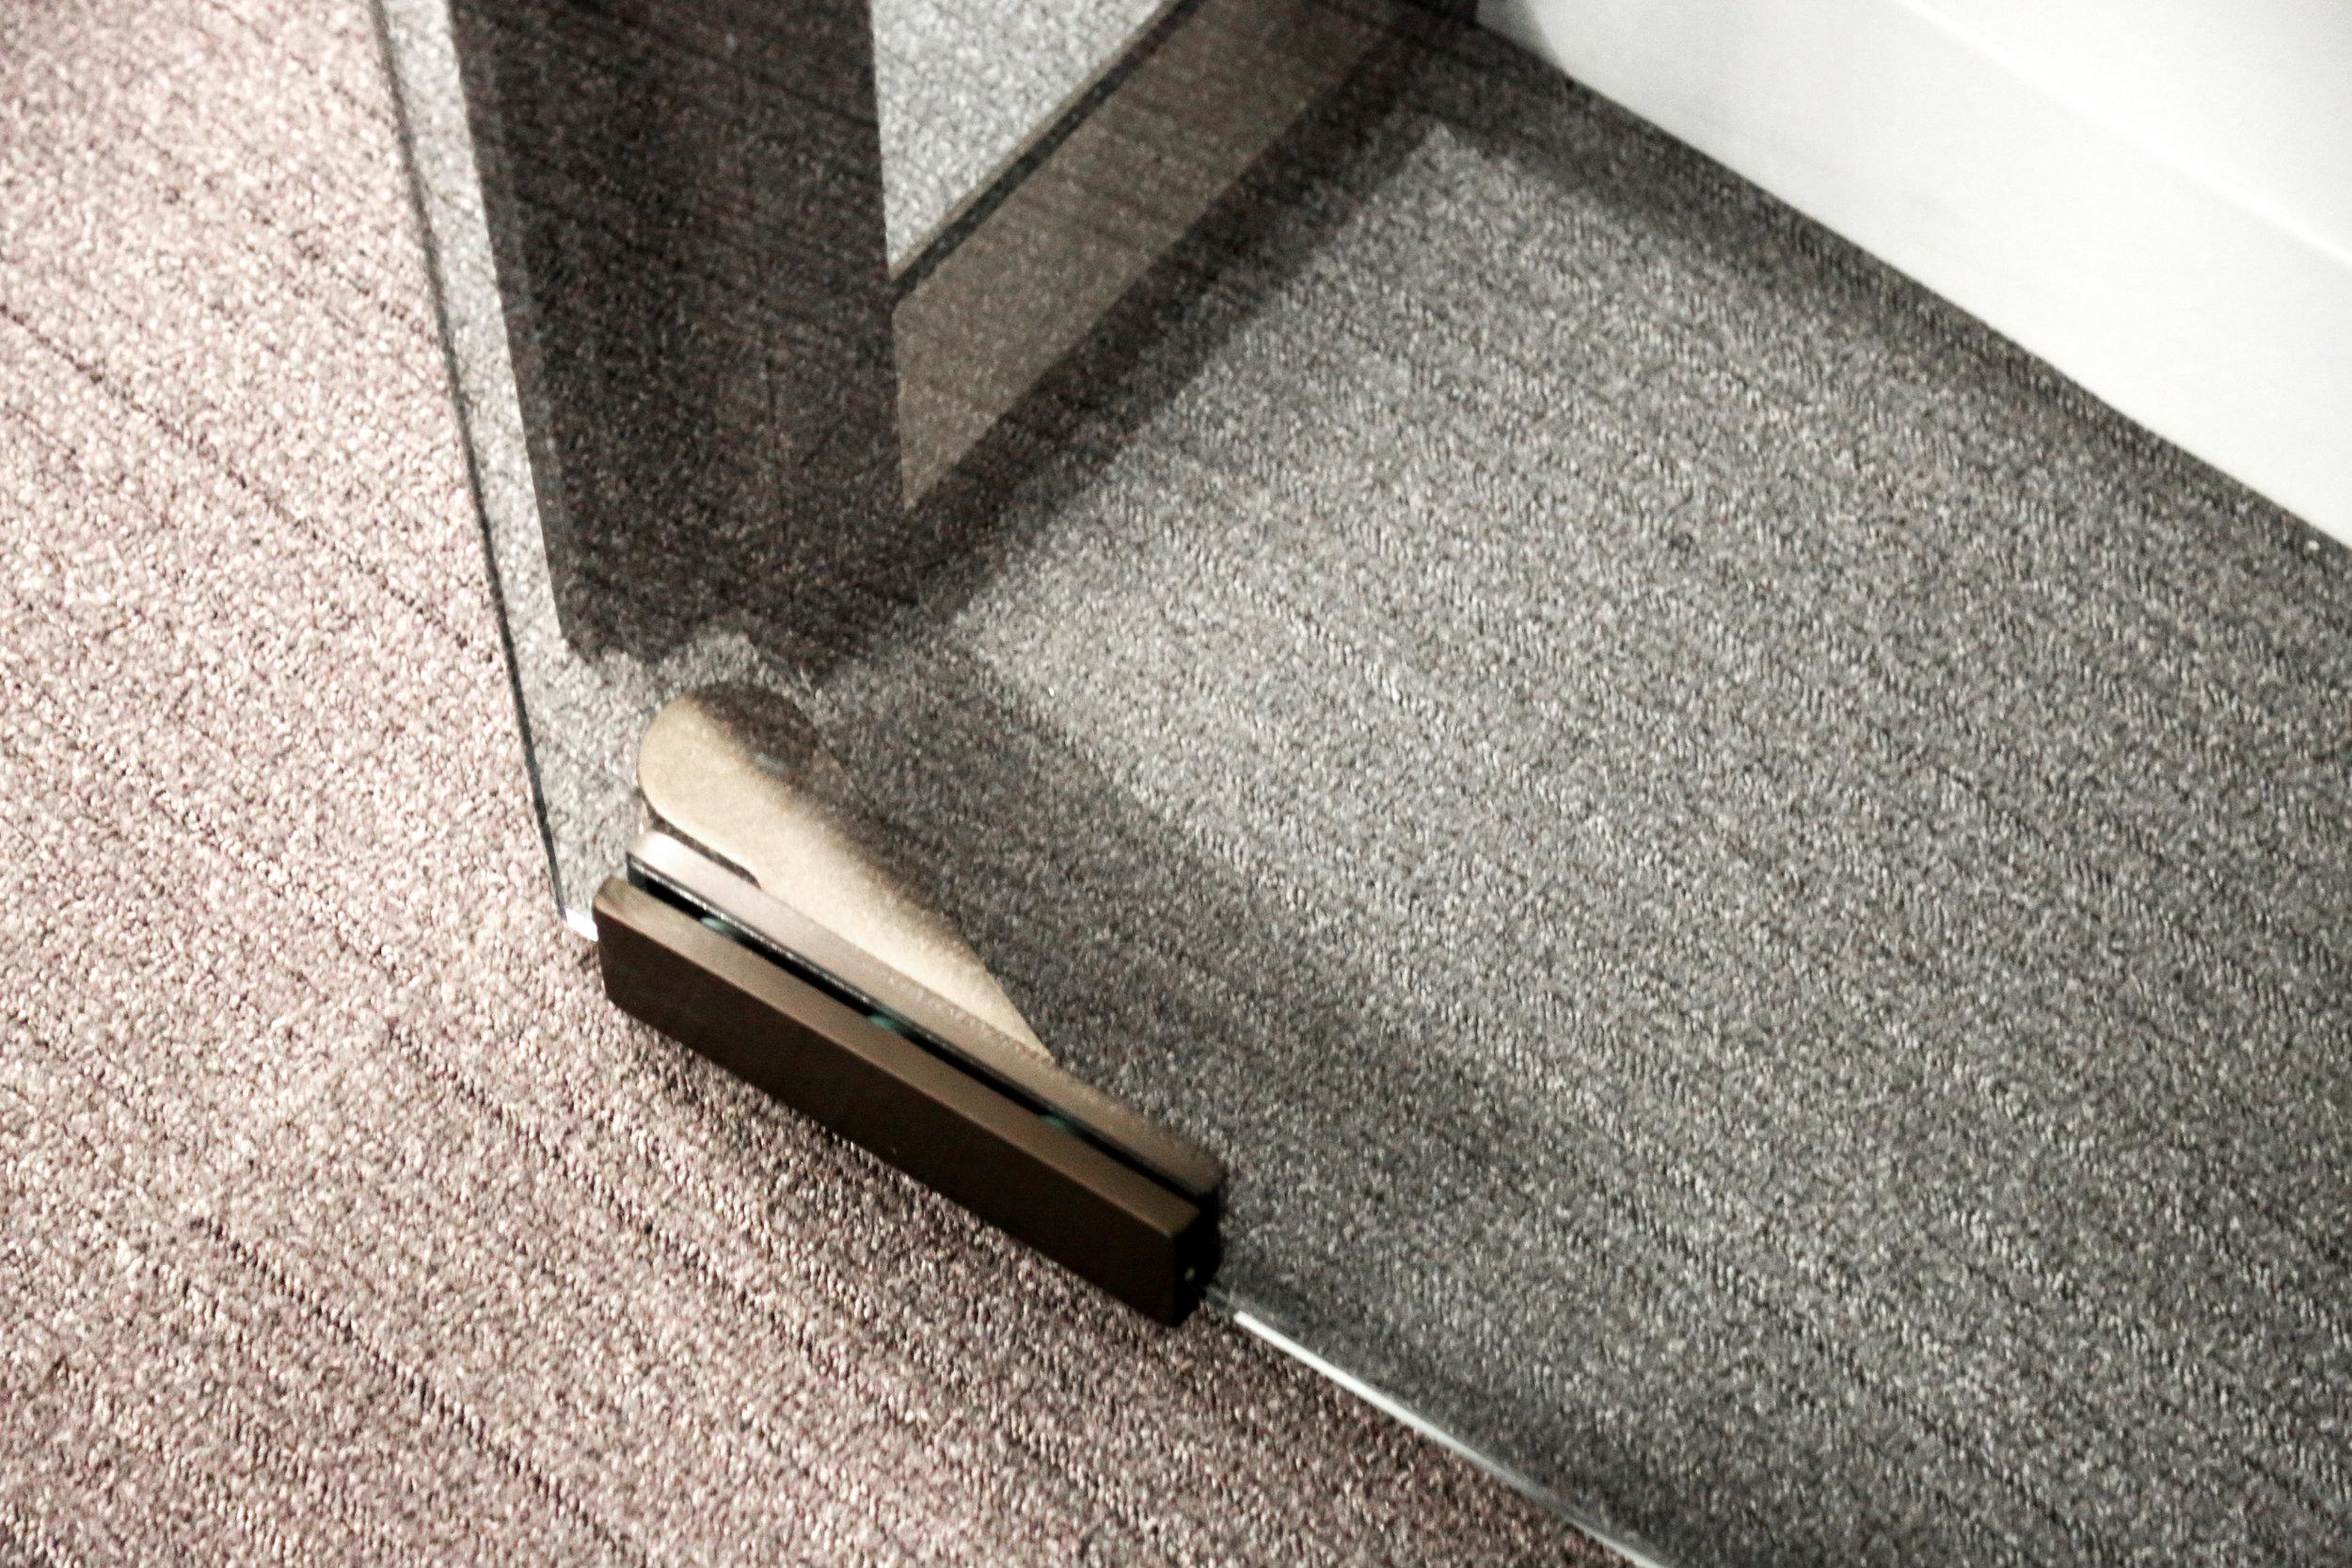 Modernus Offset Bottom Patch Fitting Frameless Glass Door - Spaceworks AI.jpg